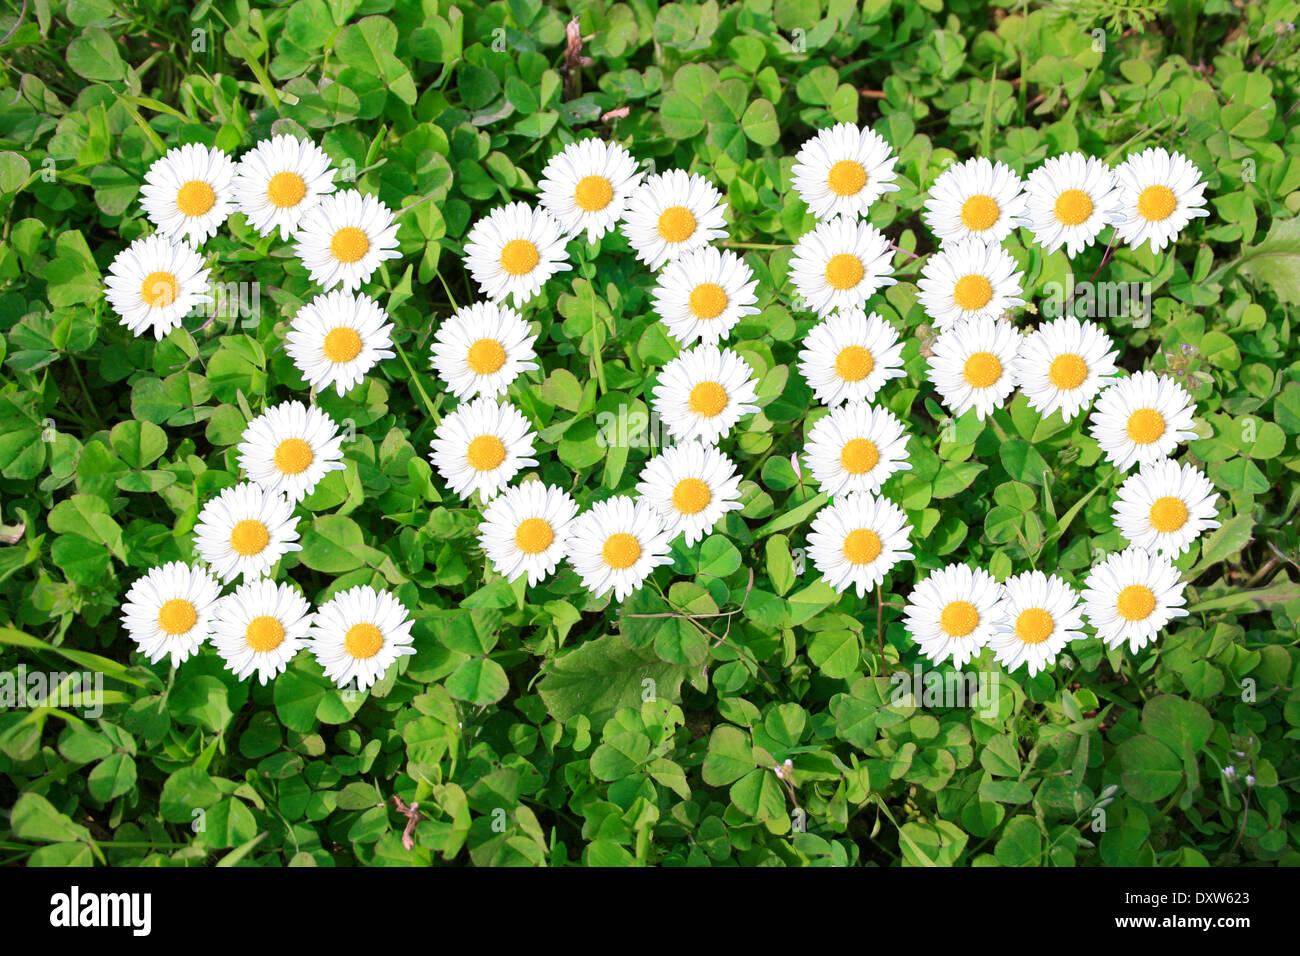 2015 with daisies on shamrocks Stock Photo